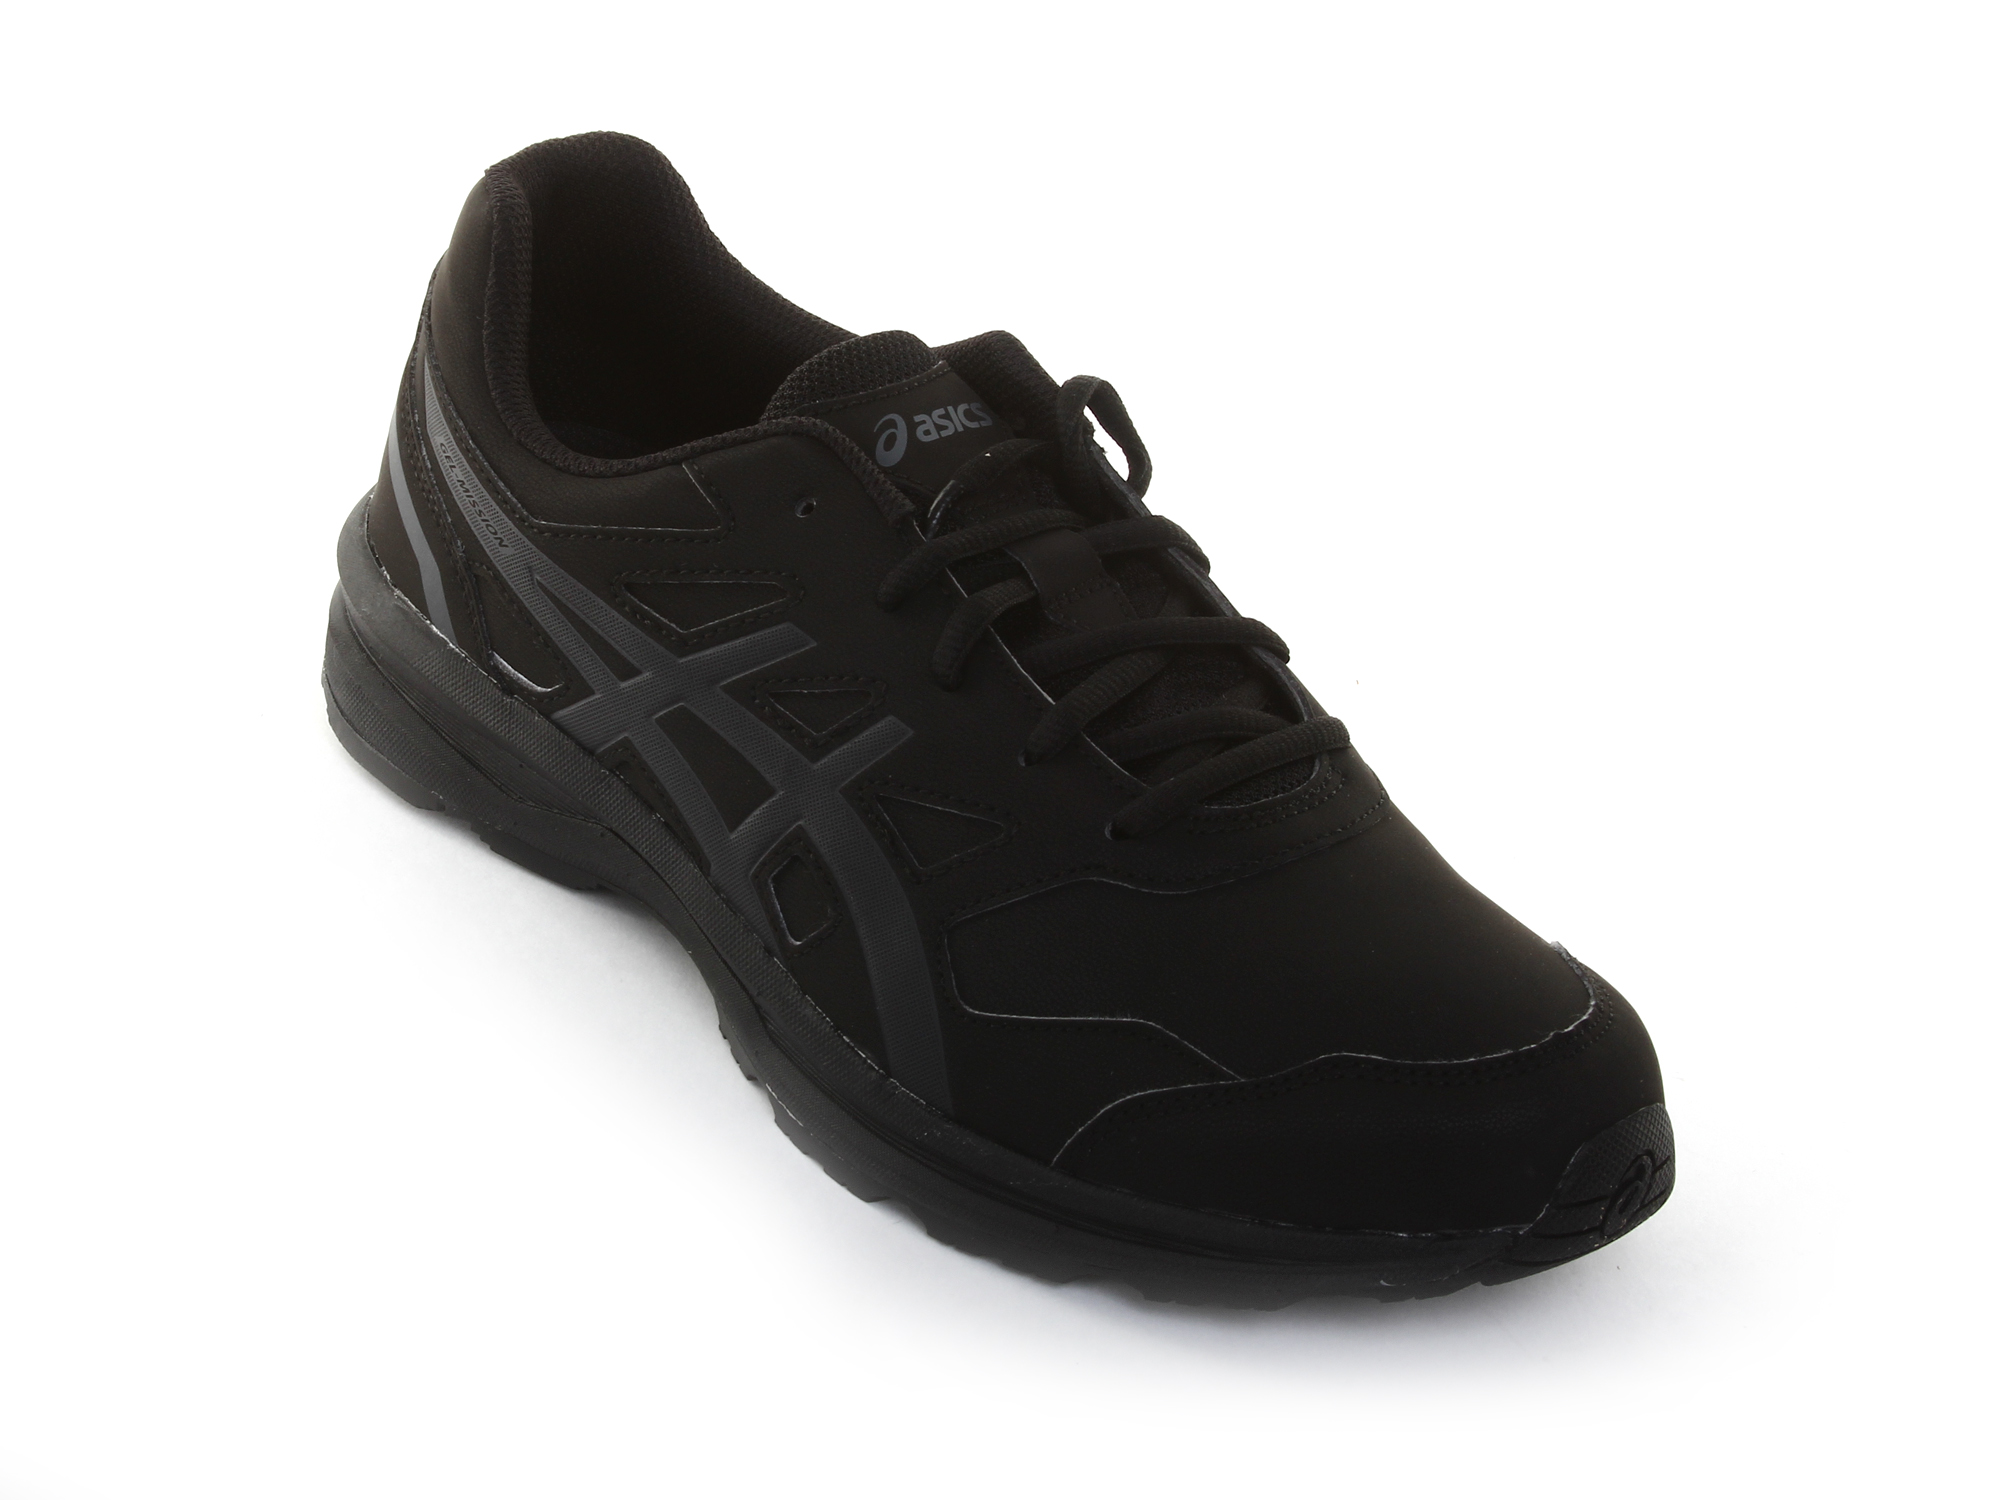 Asics Gel Mission 3 Men's Running Shoes